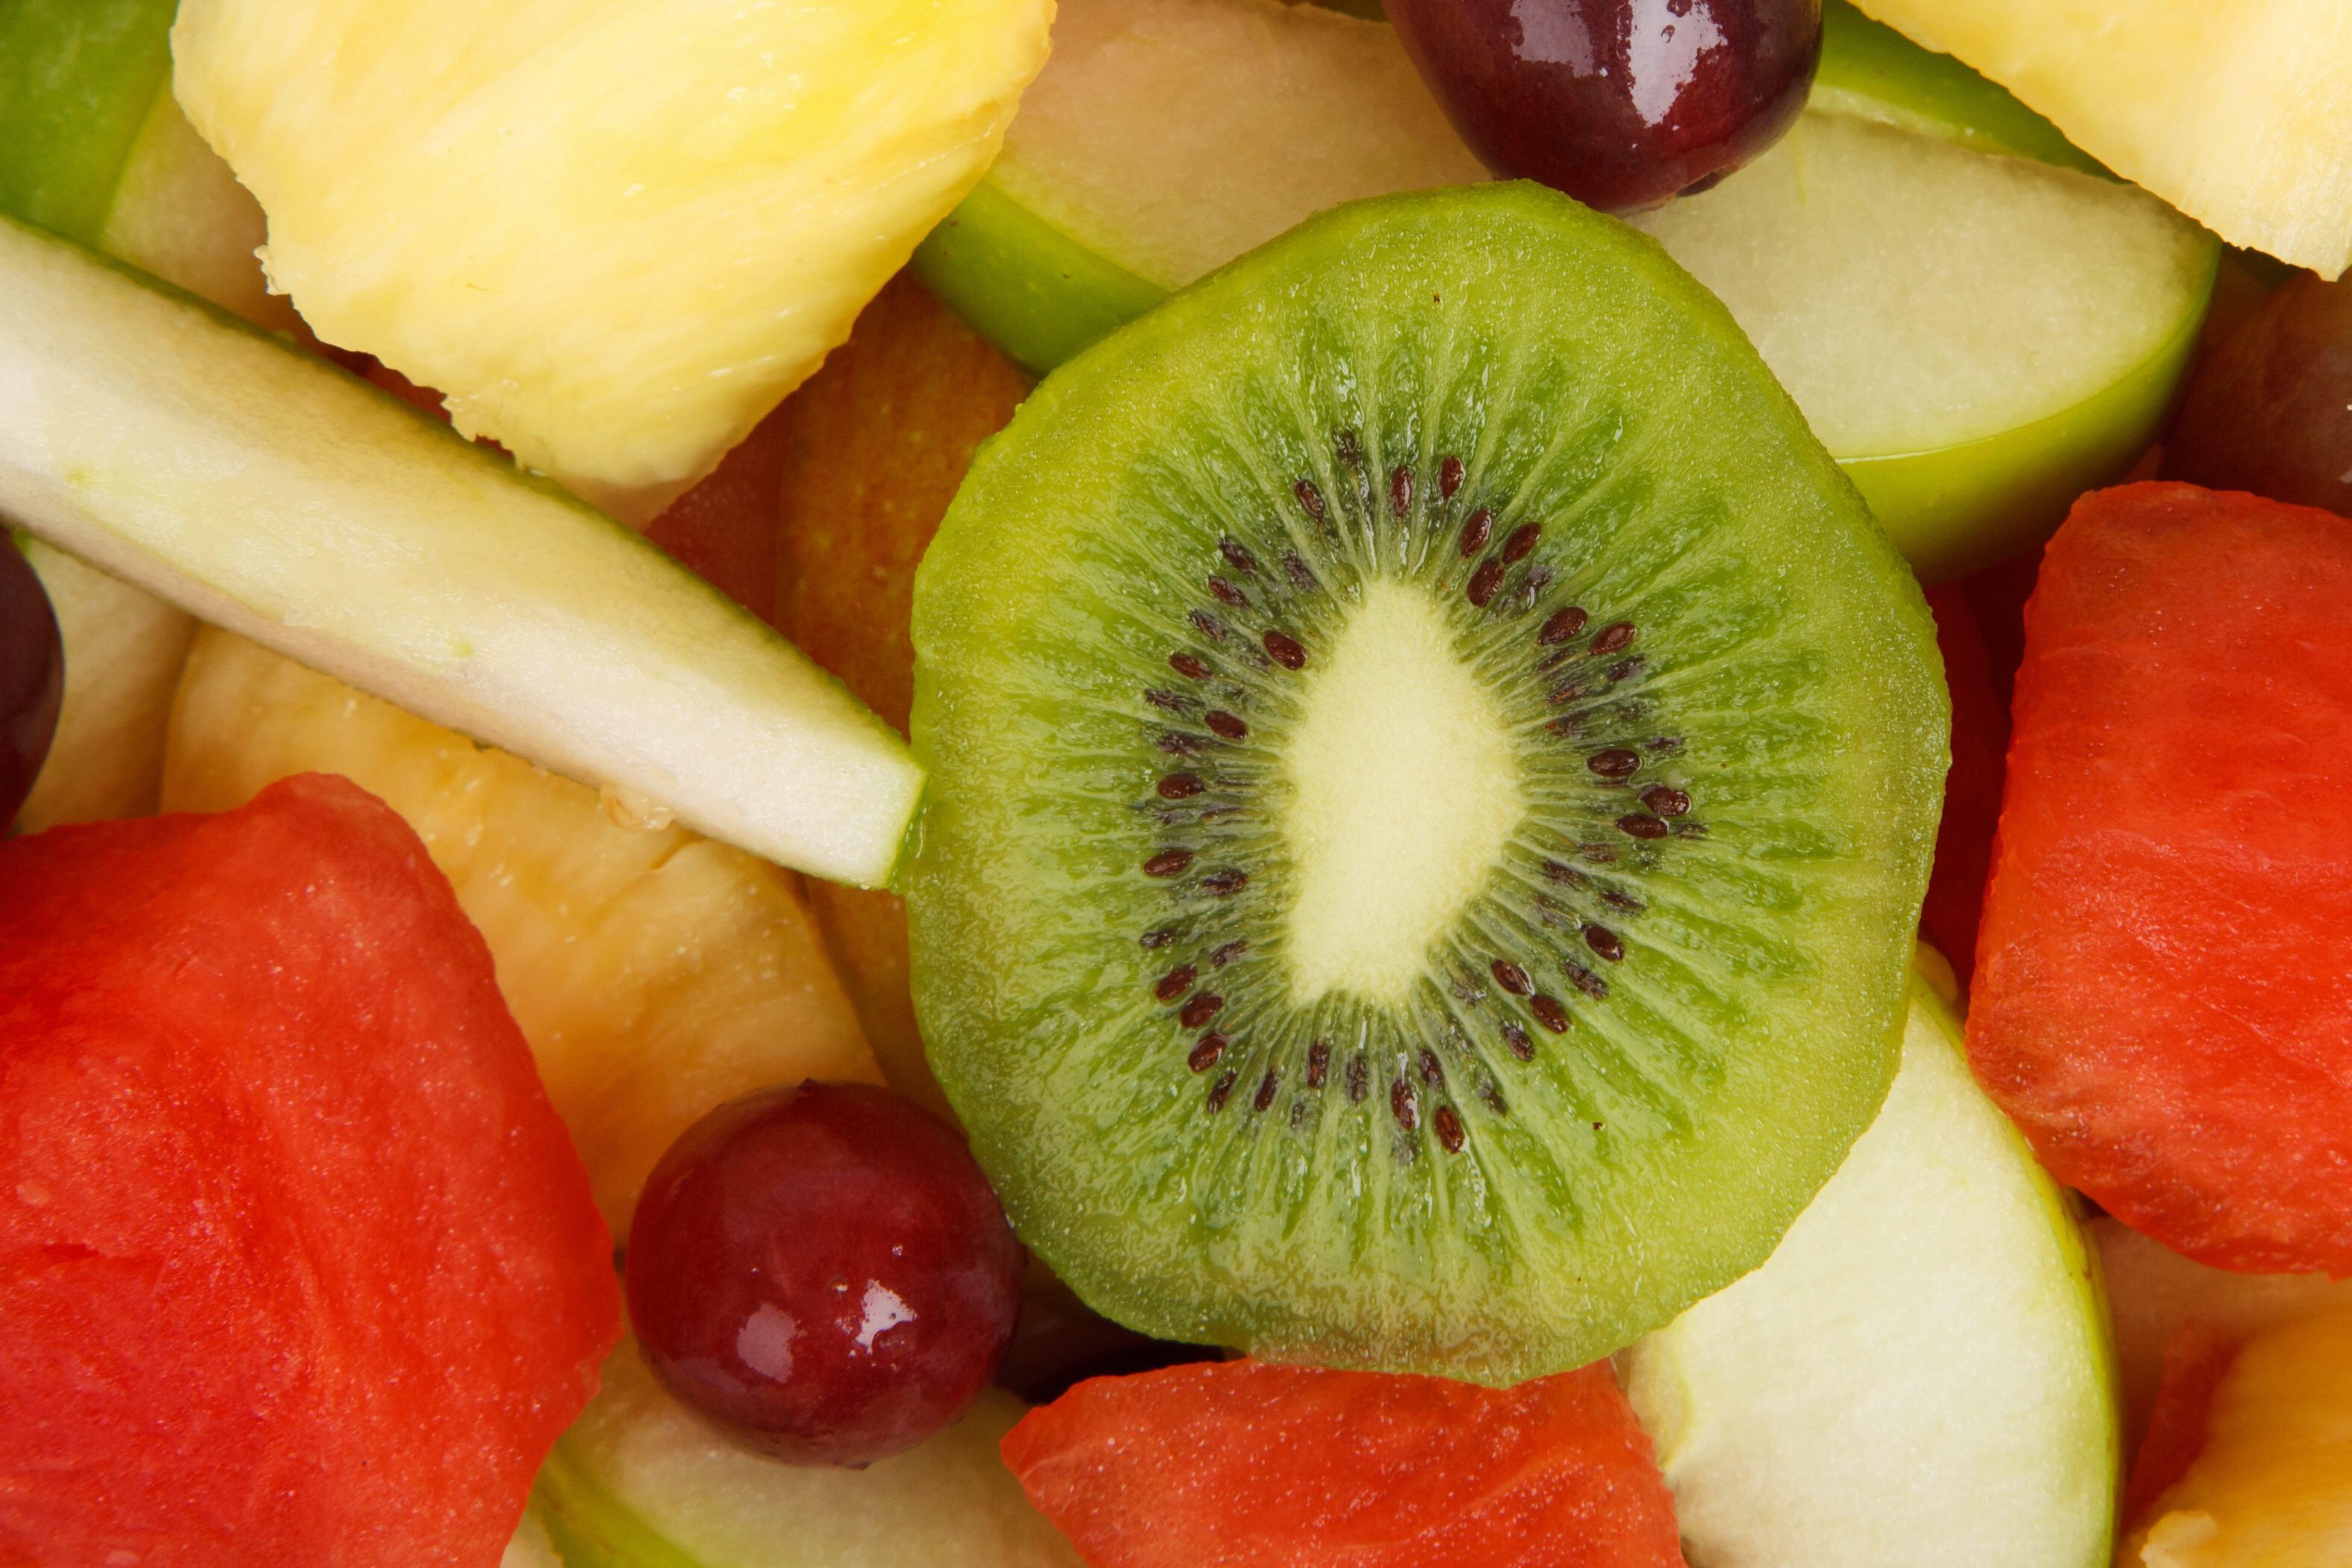 Fruit-09